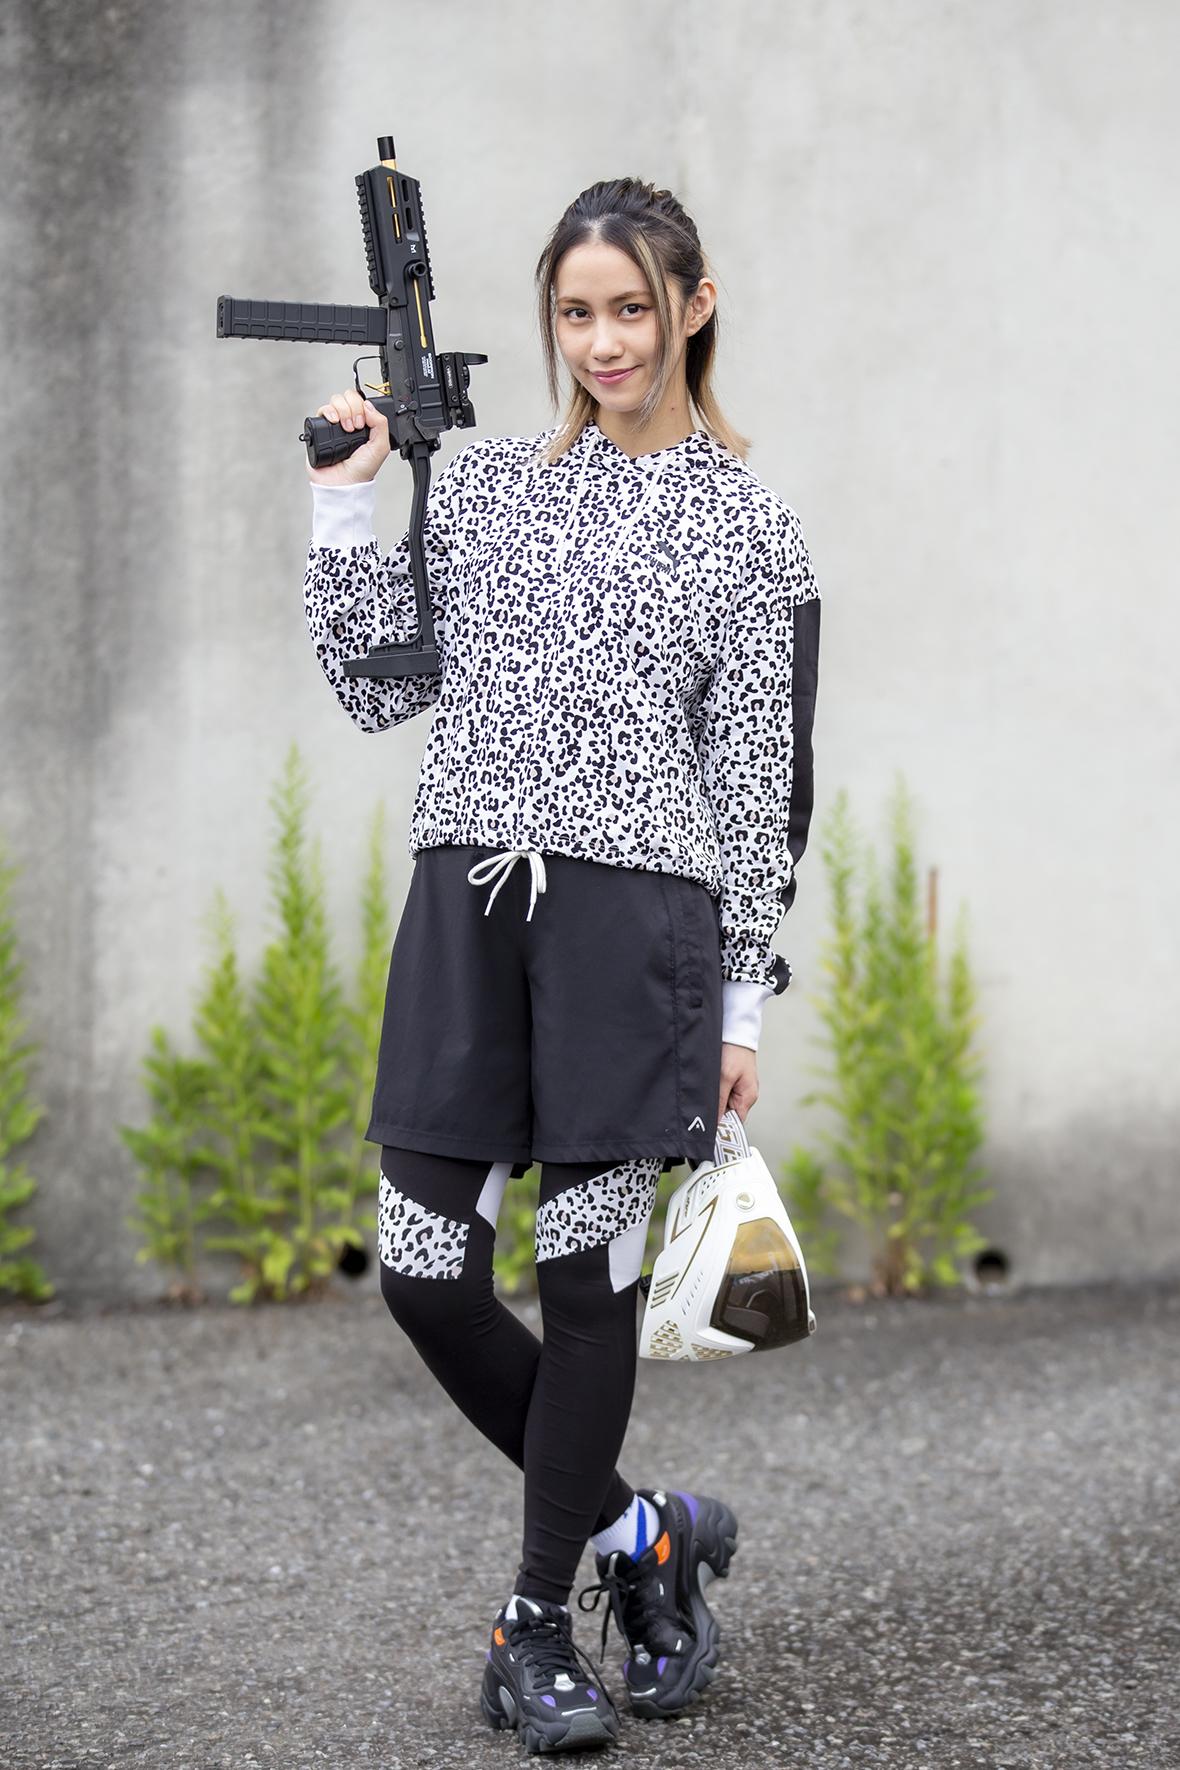 sg_fashion_snap_ZE0914-02-Misae-Komori-00